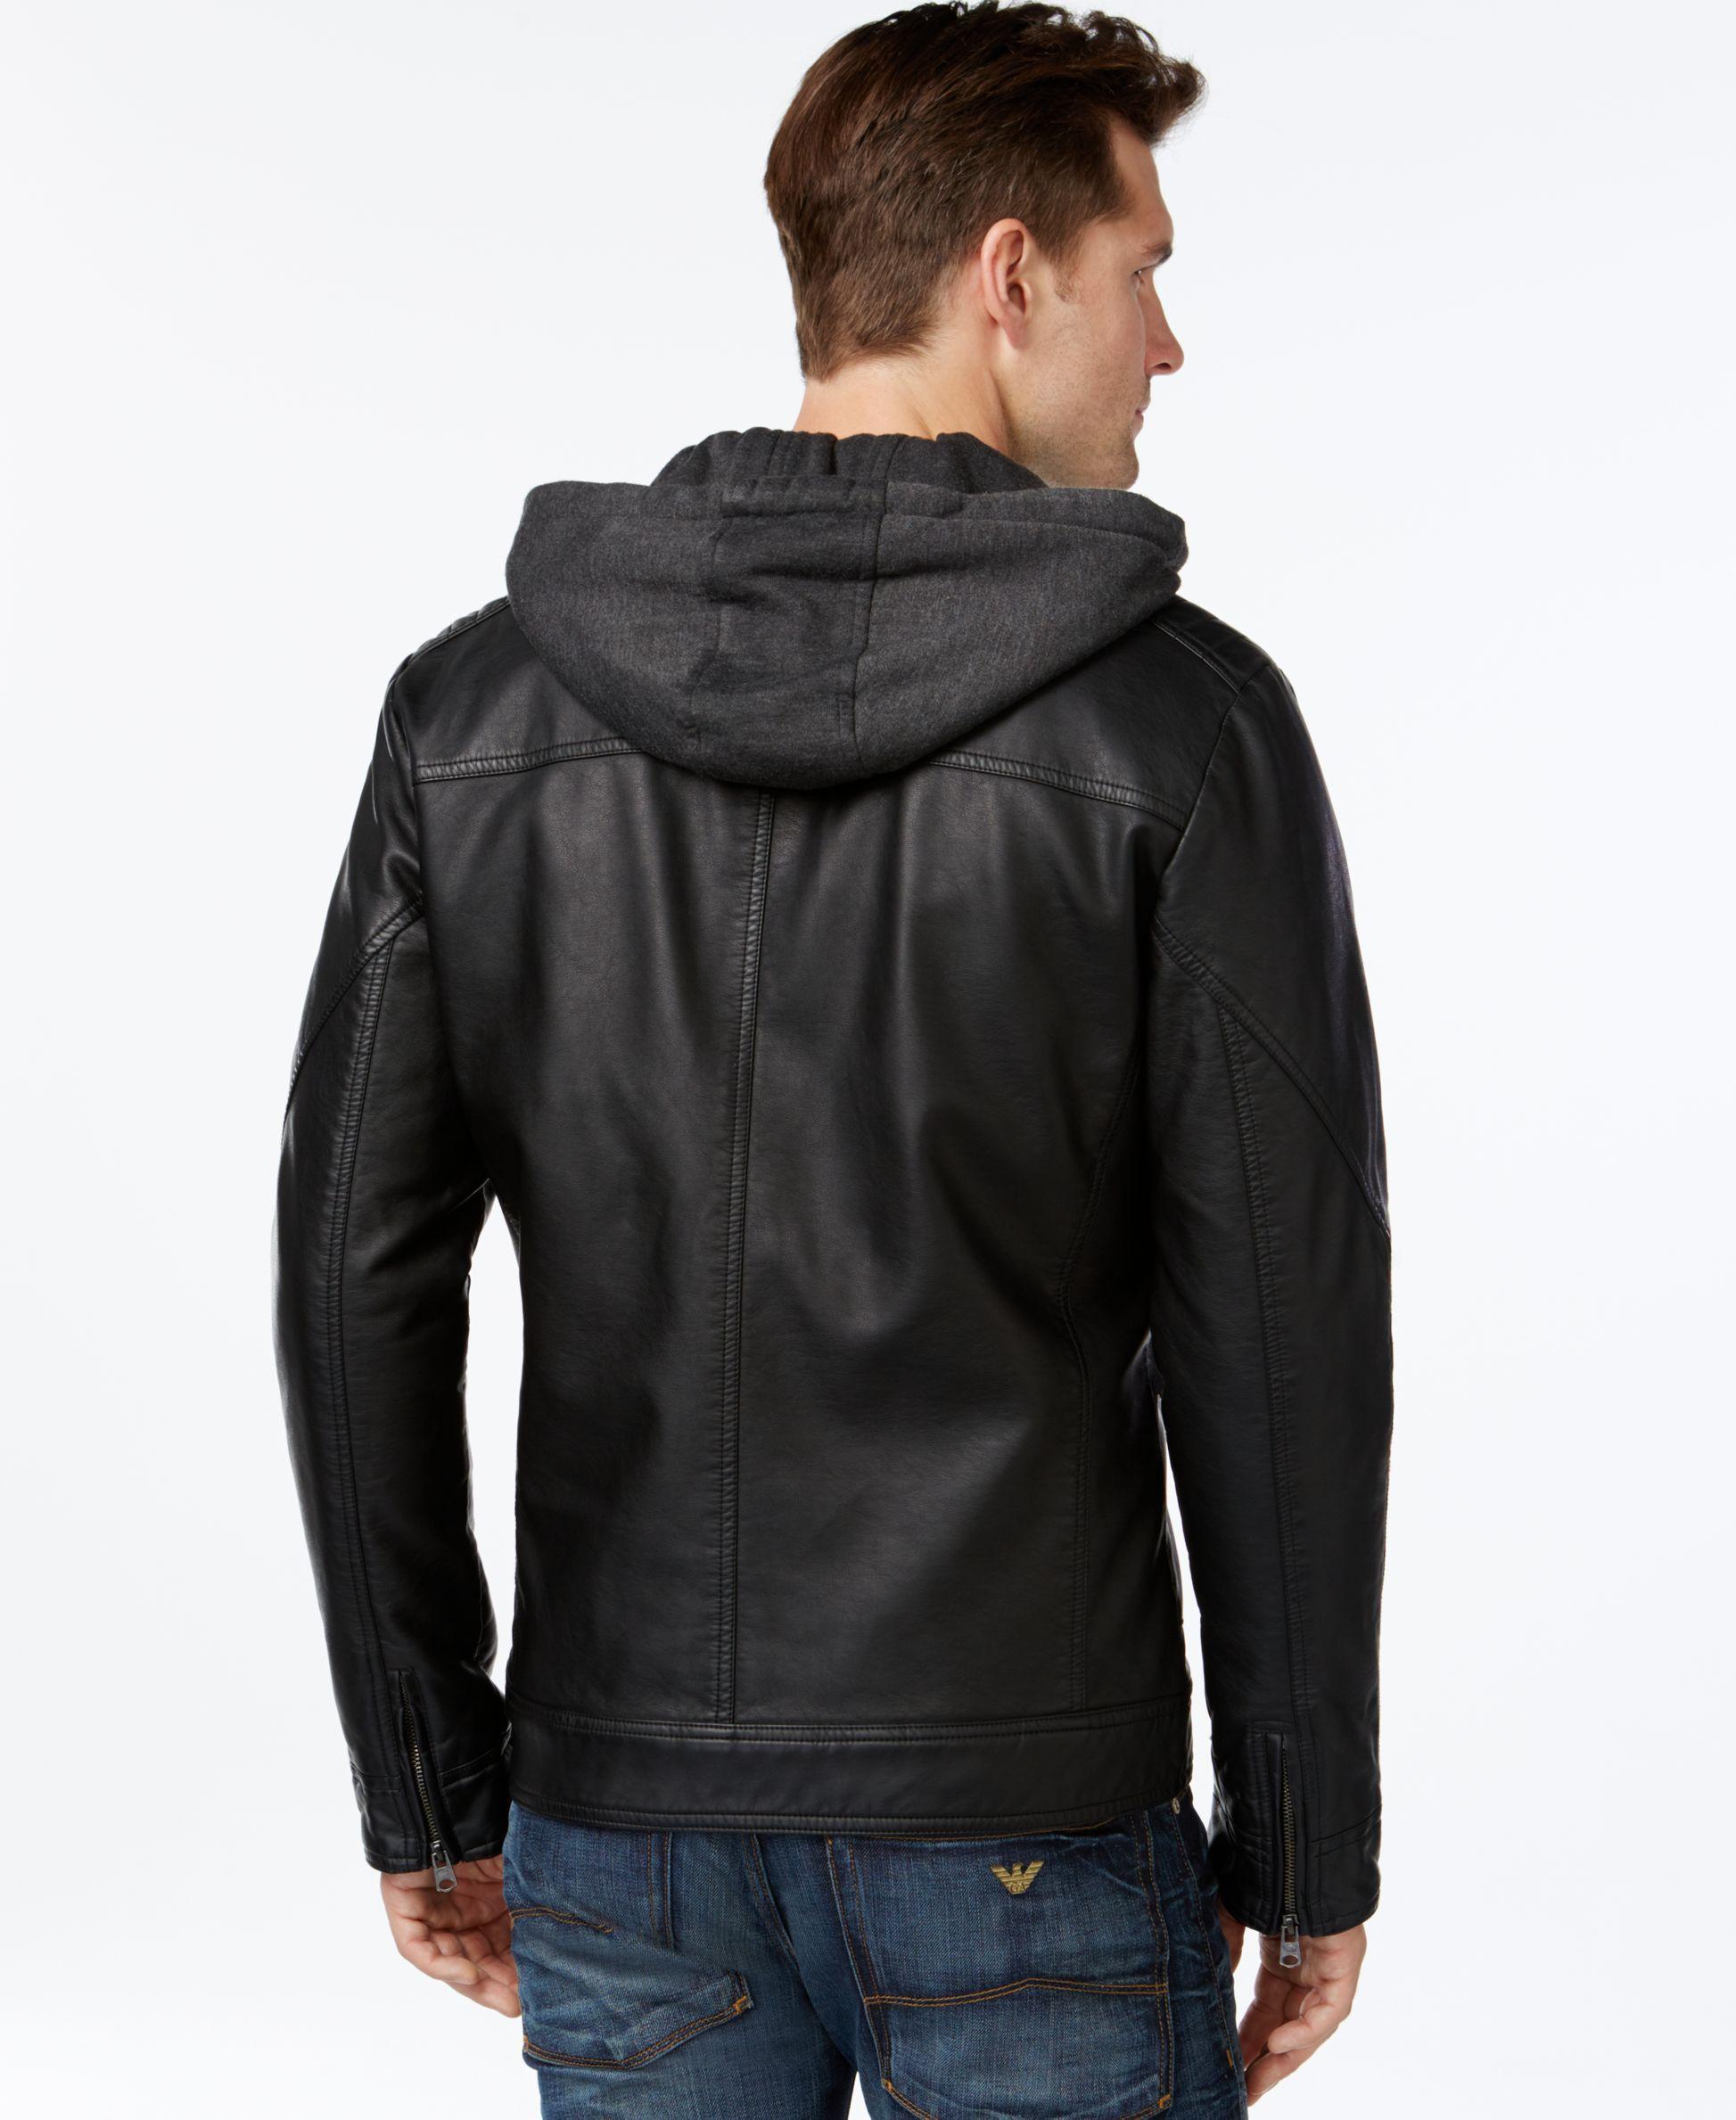 Buffalo David Bitton Big Tall Bibbed Faux Leather Jacket Coats Jackets Men Macy S Leather Jacket Leather Jackets Online Faux Leather Jackets [ 2378 x 1947 Pixel ]